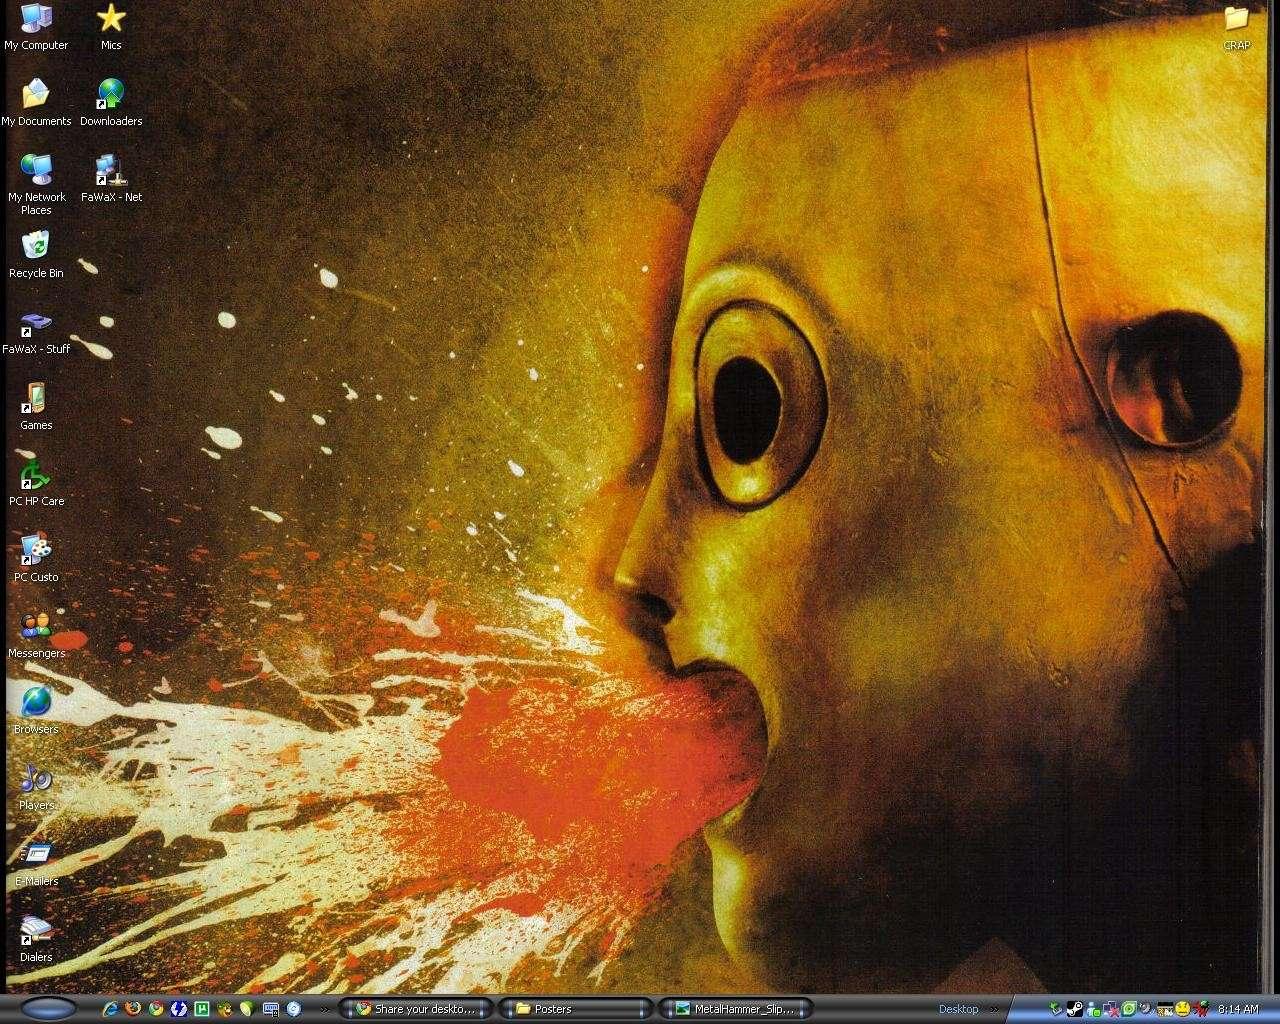 Share your desktop screenshots! My_dek12